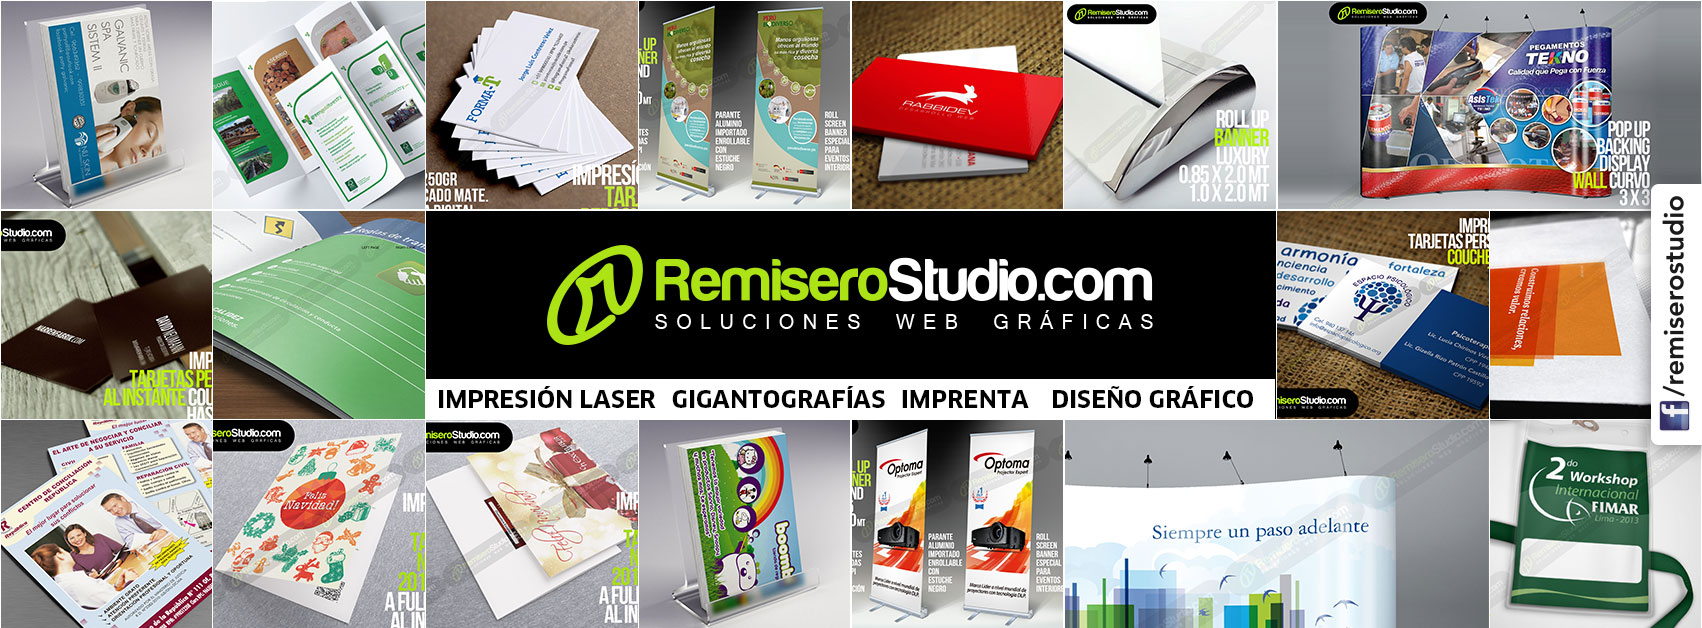 RemiseroStudio Soluciones Web Gráficas | Imprenta Láser Digital